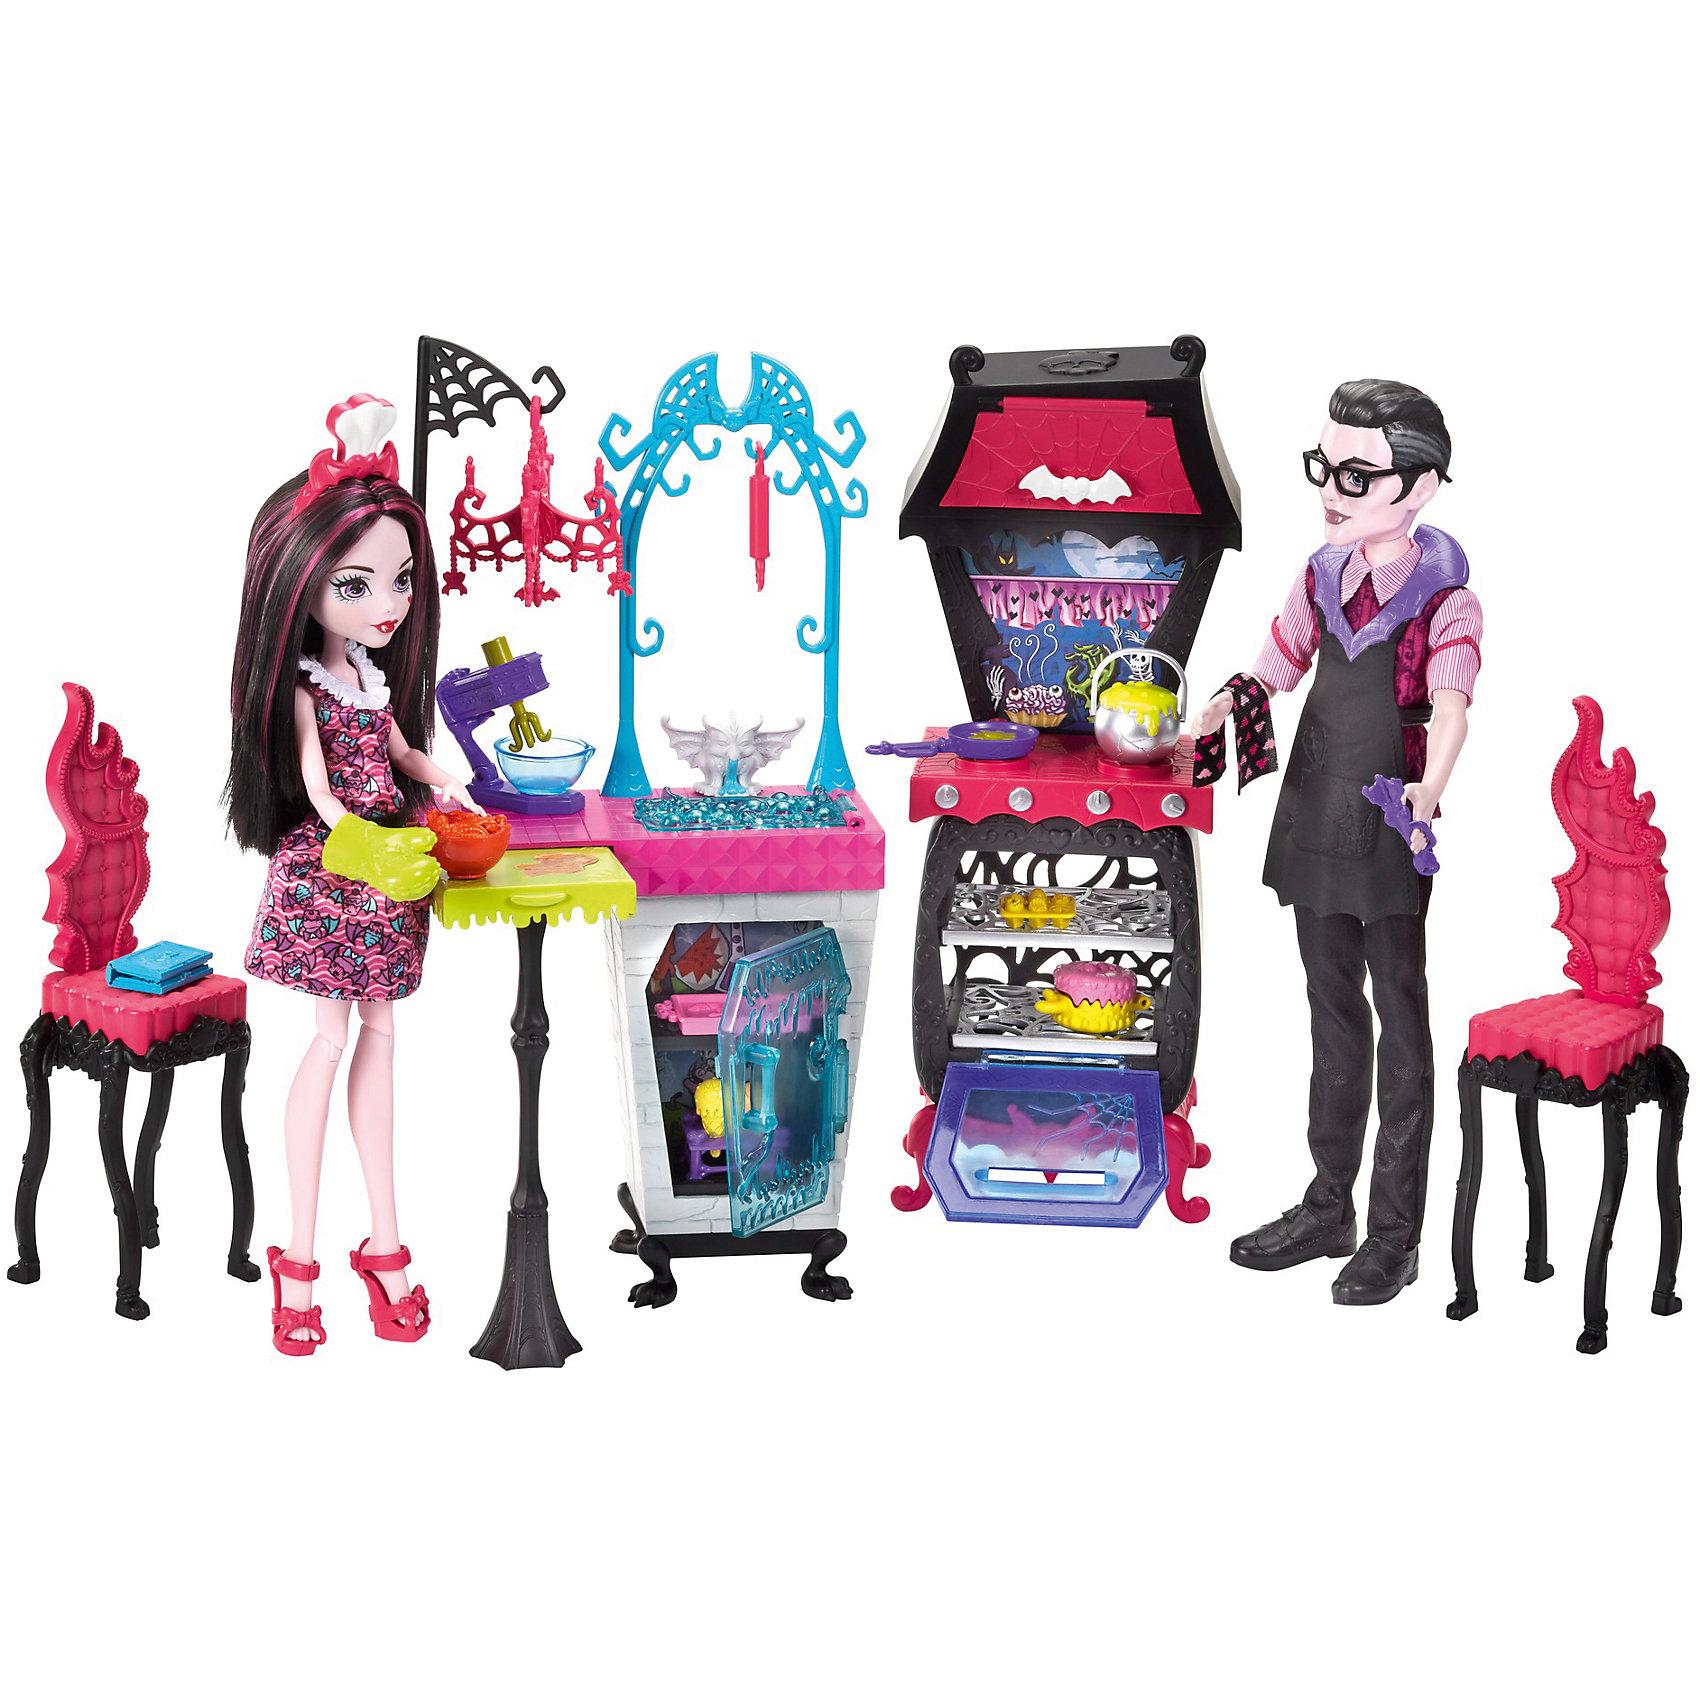 Игровой набор Monster High Семья Дракулауры из серии Семья МонстриковНаборы кукол<br><br><br>Ширина мм: 325<br>Глубина мм: 100<br>Высота мм: 485<br>Вес г: 900<br>Возраст от месяцев: 72<br>Возраст до месяцев: 2147483647<br>Пол: Женский<br>Возраст: Детский<br>SKU: 7014674